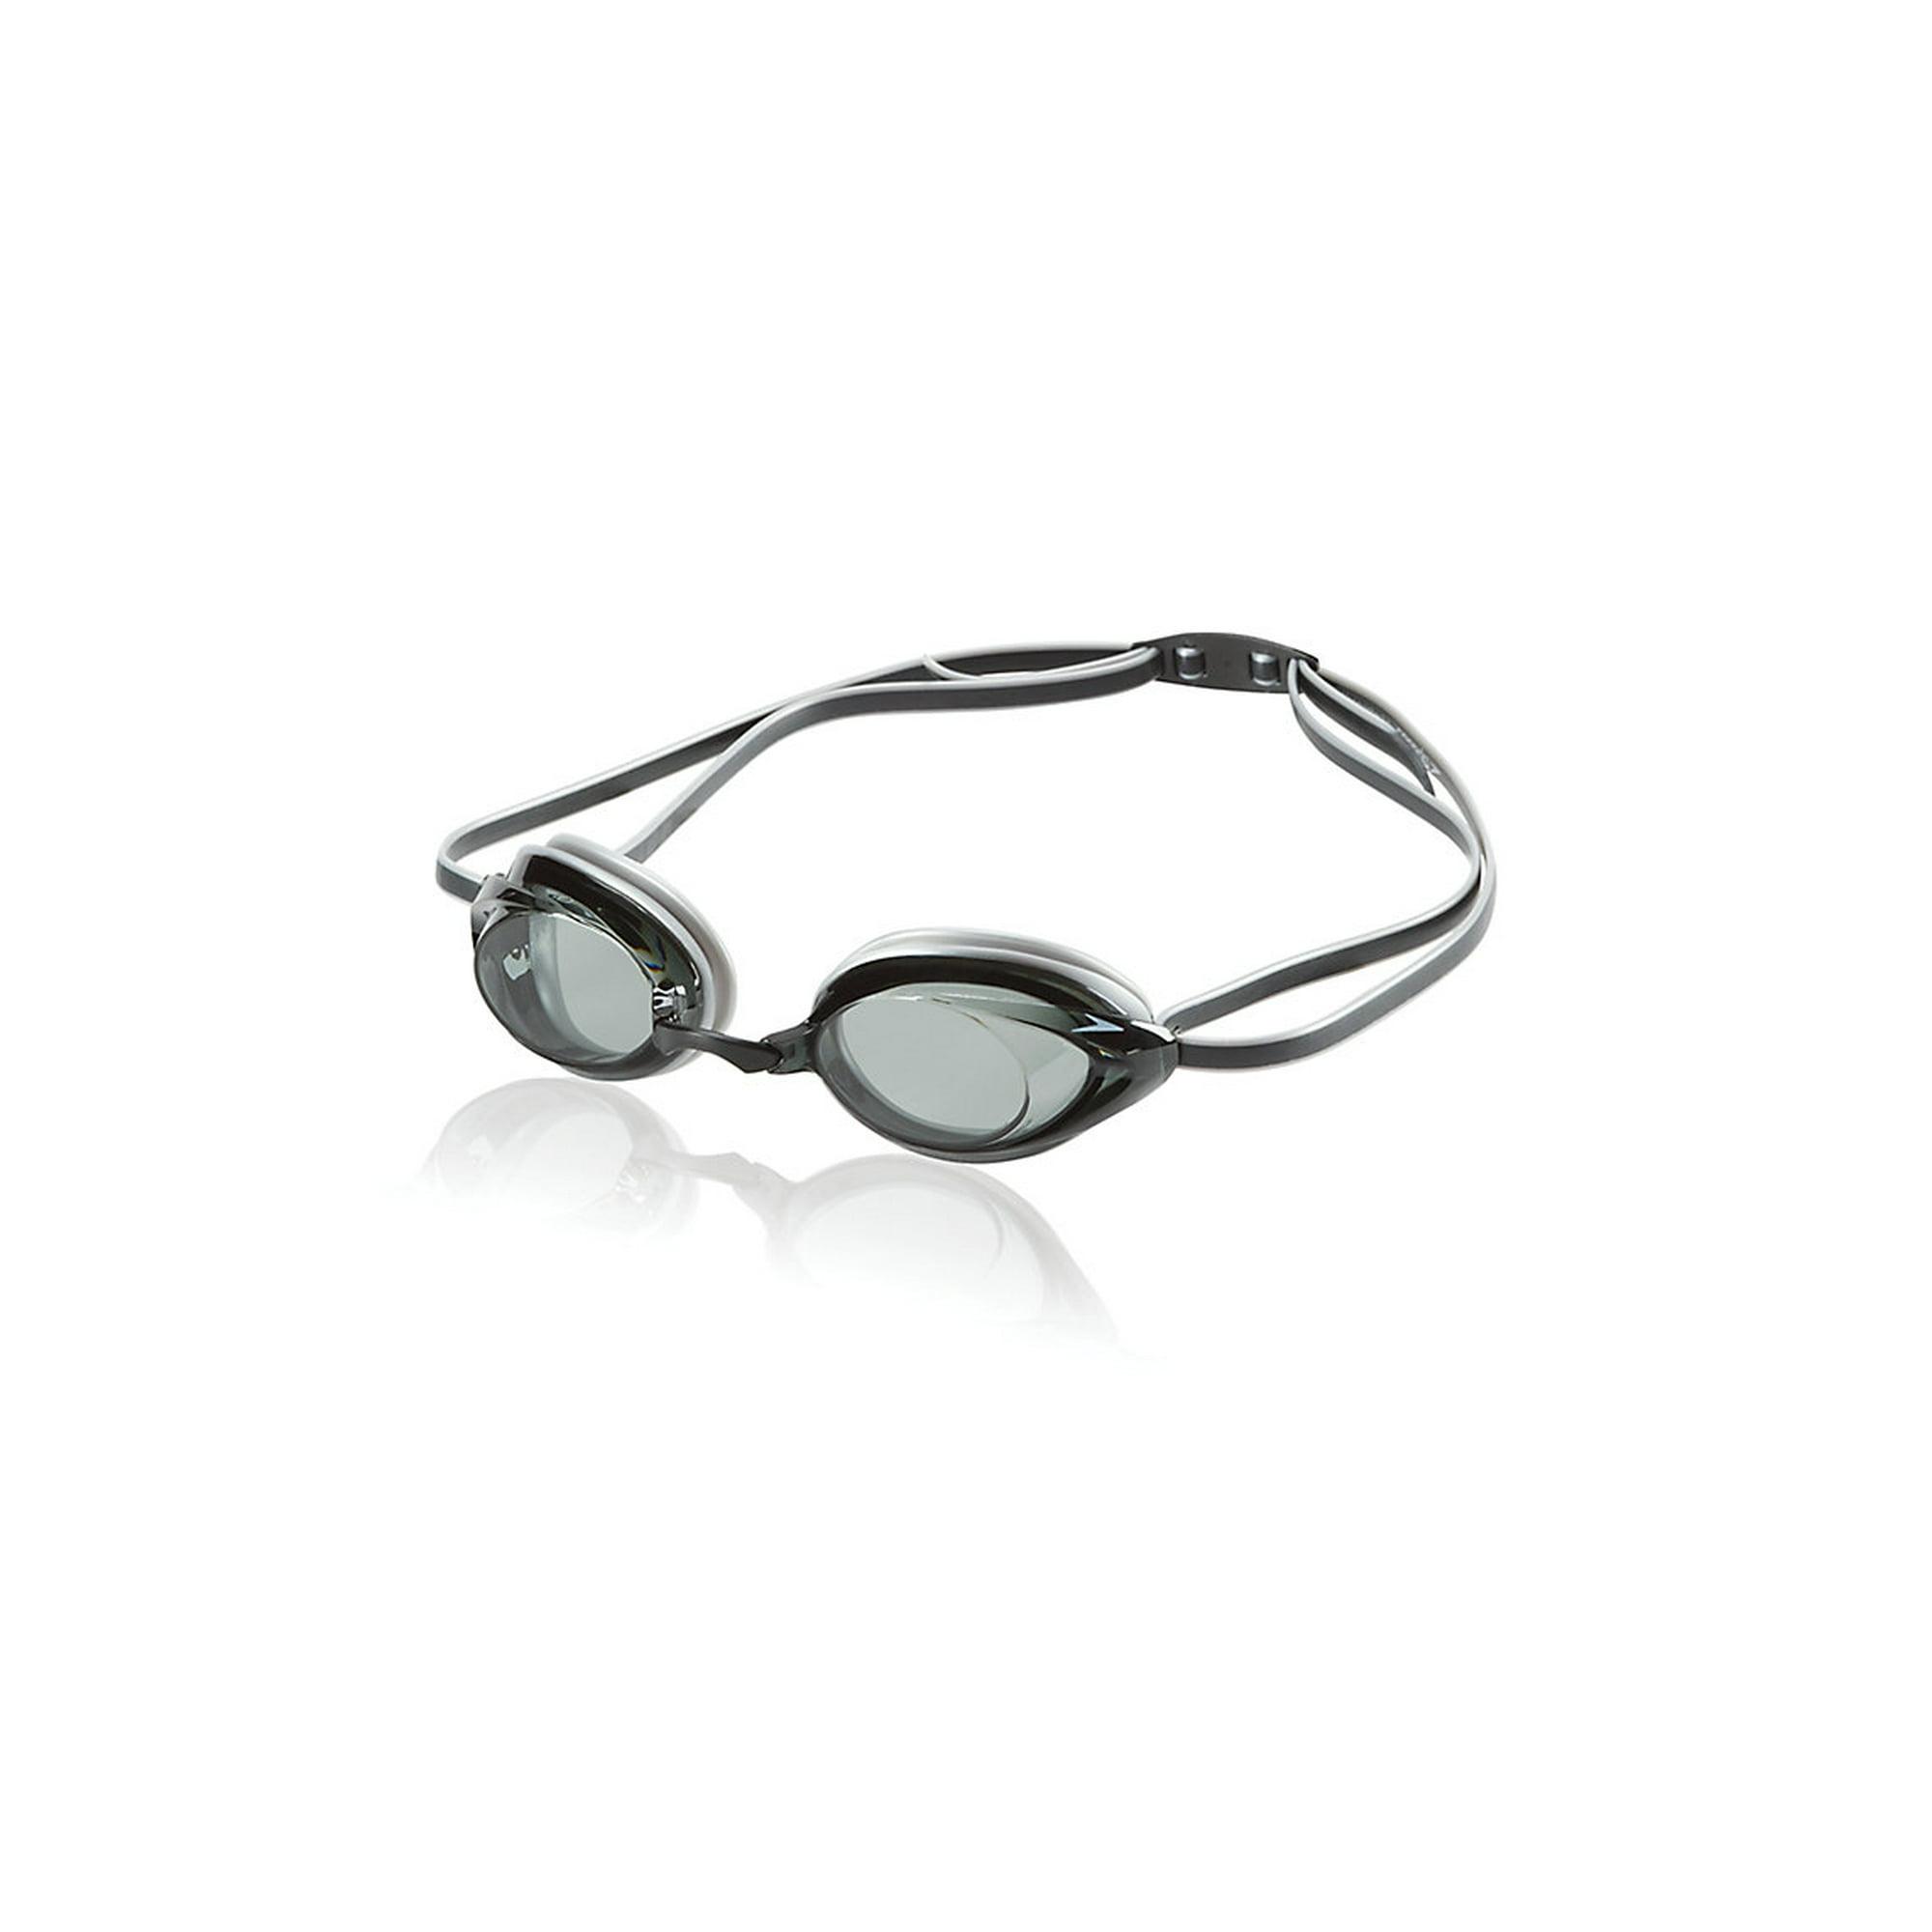 ecc179f4223 Speedo Vanquisher 2.0 Anti-Fog Swim Swimming Competition Pool Sport Goggle  Smoke